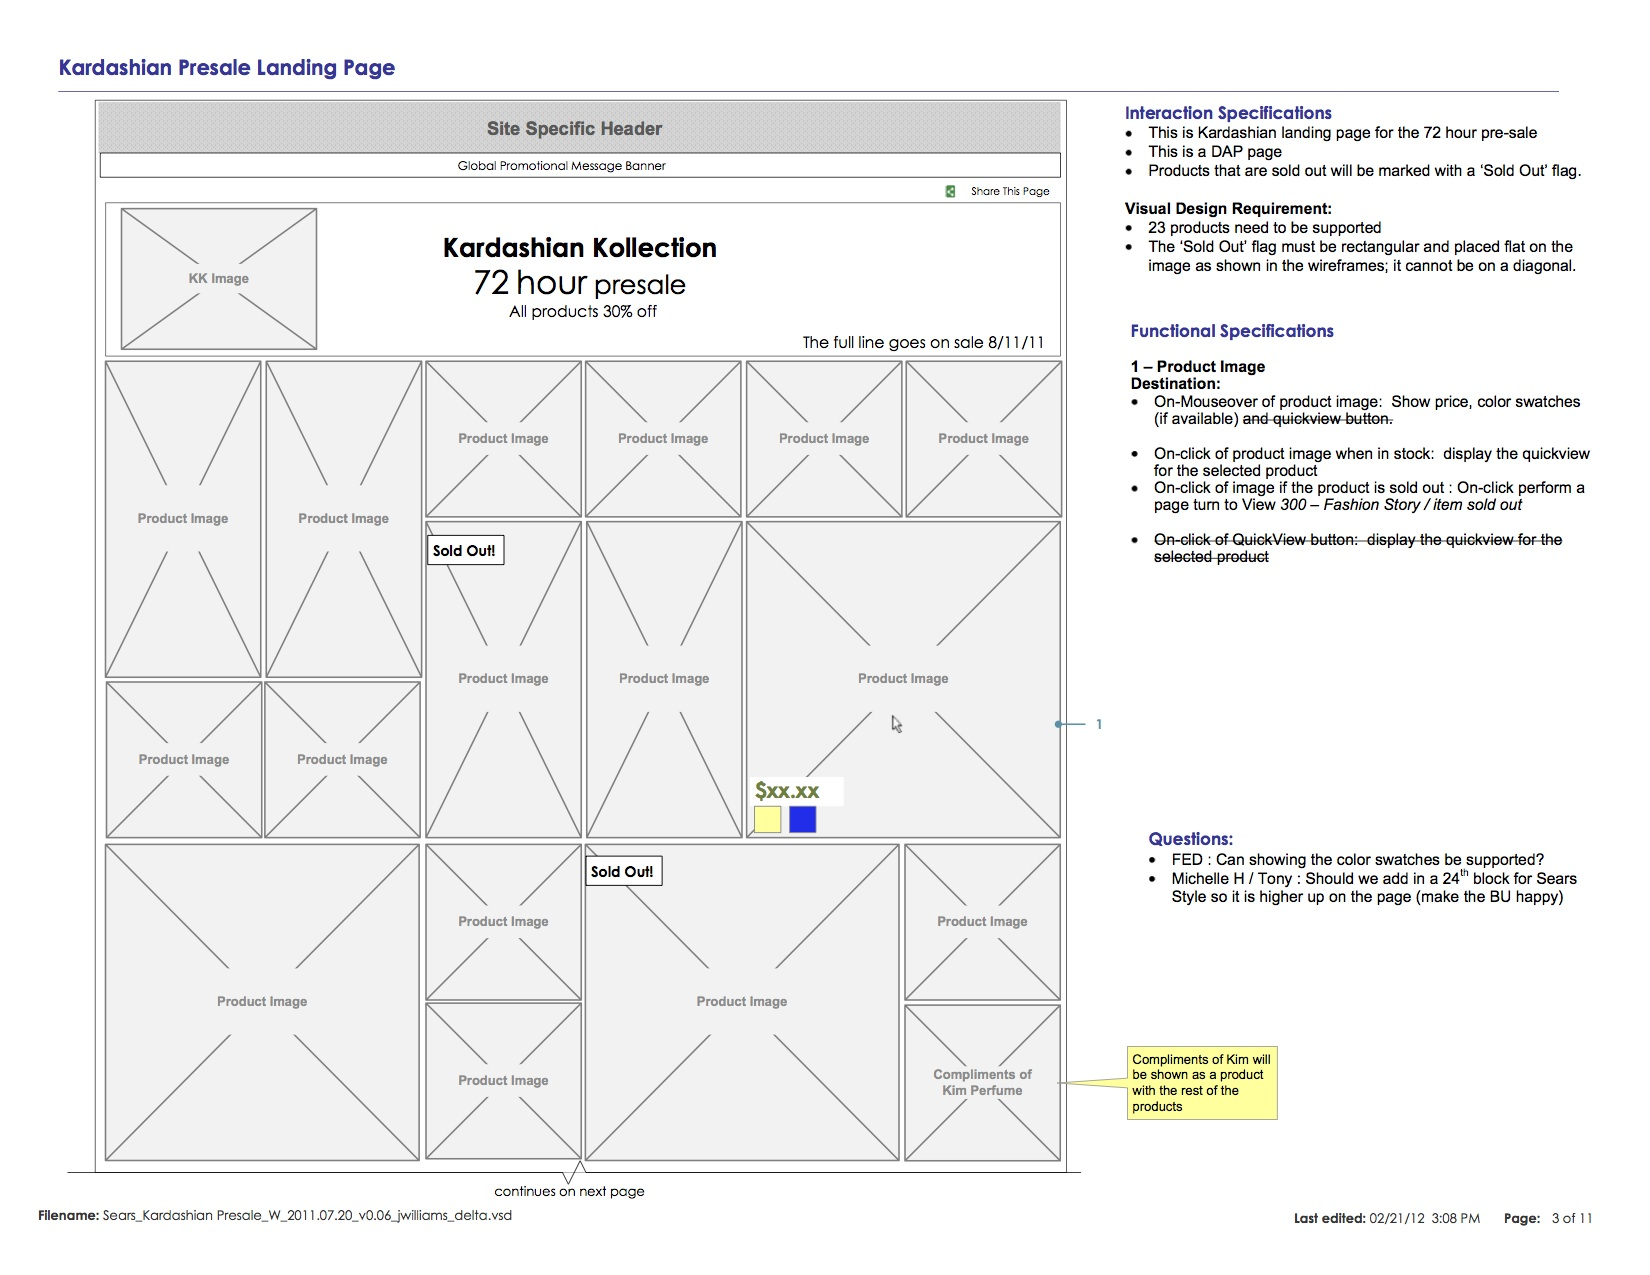 Kardashian Kollection Presale Landing Page Wireframe